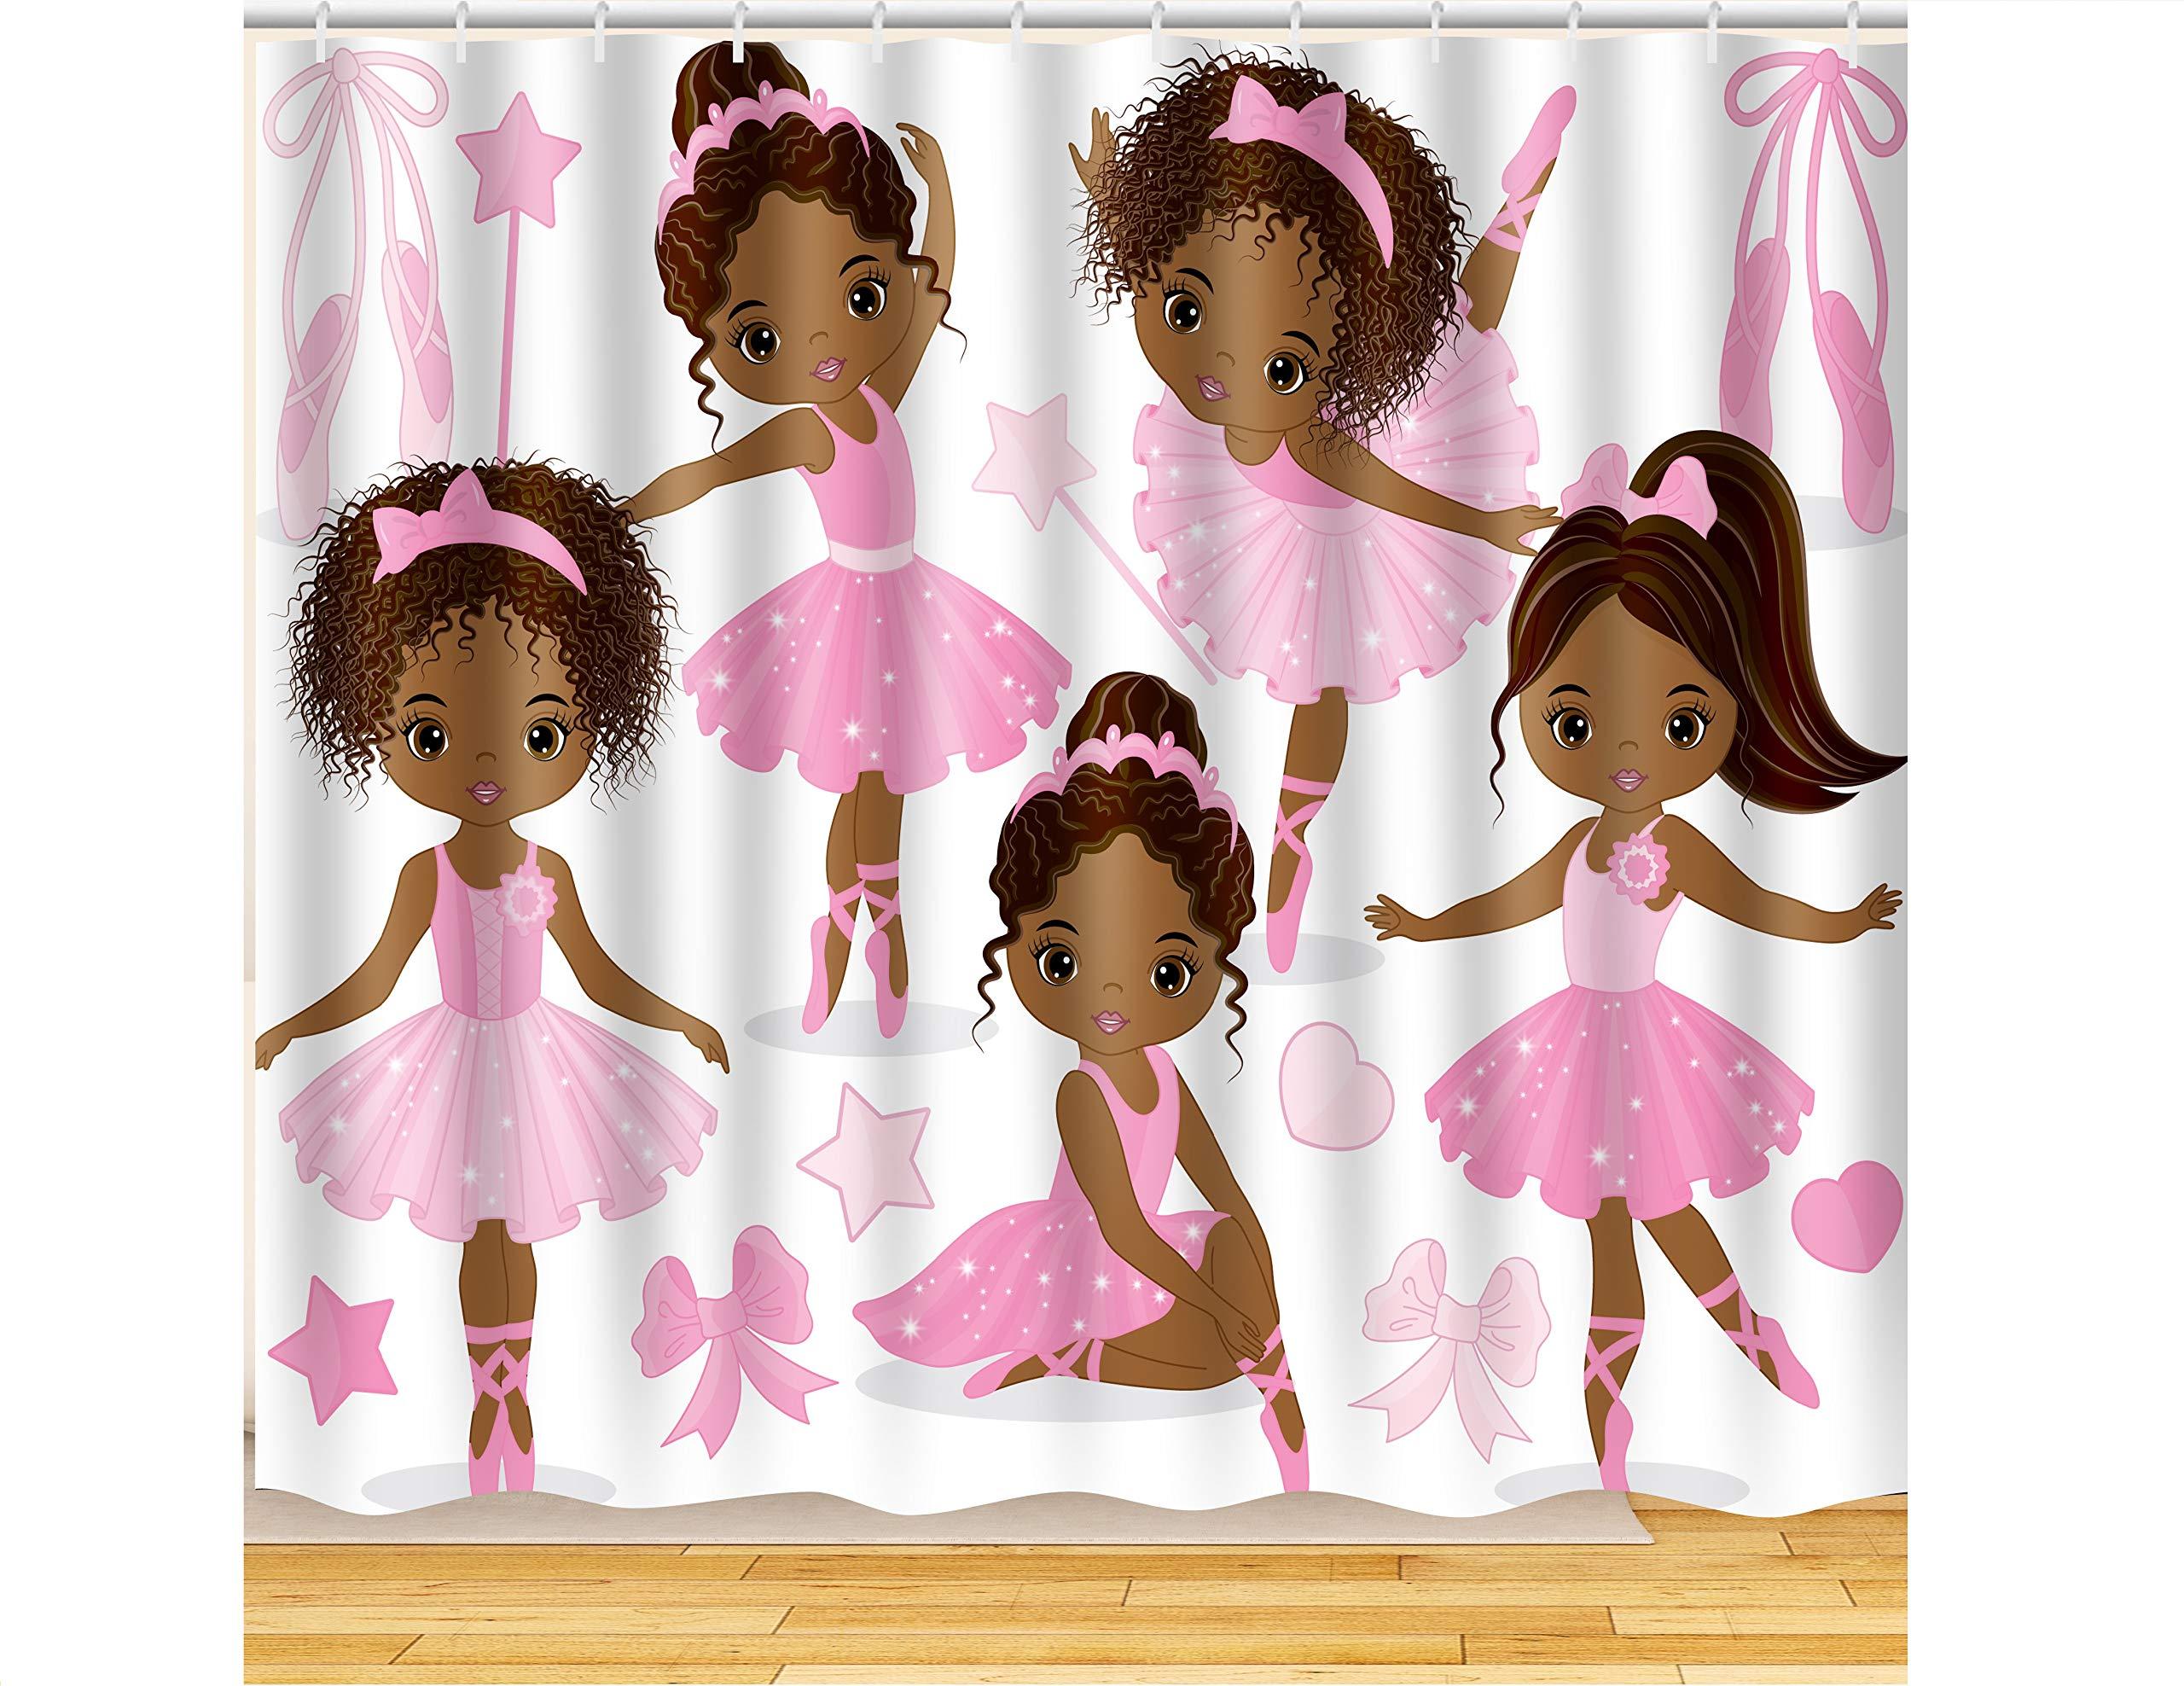 ArtRena Quality Fabric Shower Curtain, Dark-Skinned, Black Girl Ballerinas, Waterproof and Mildew Resistant, 71'' x 71''